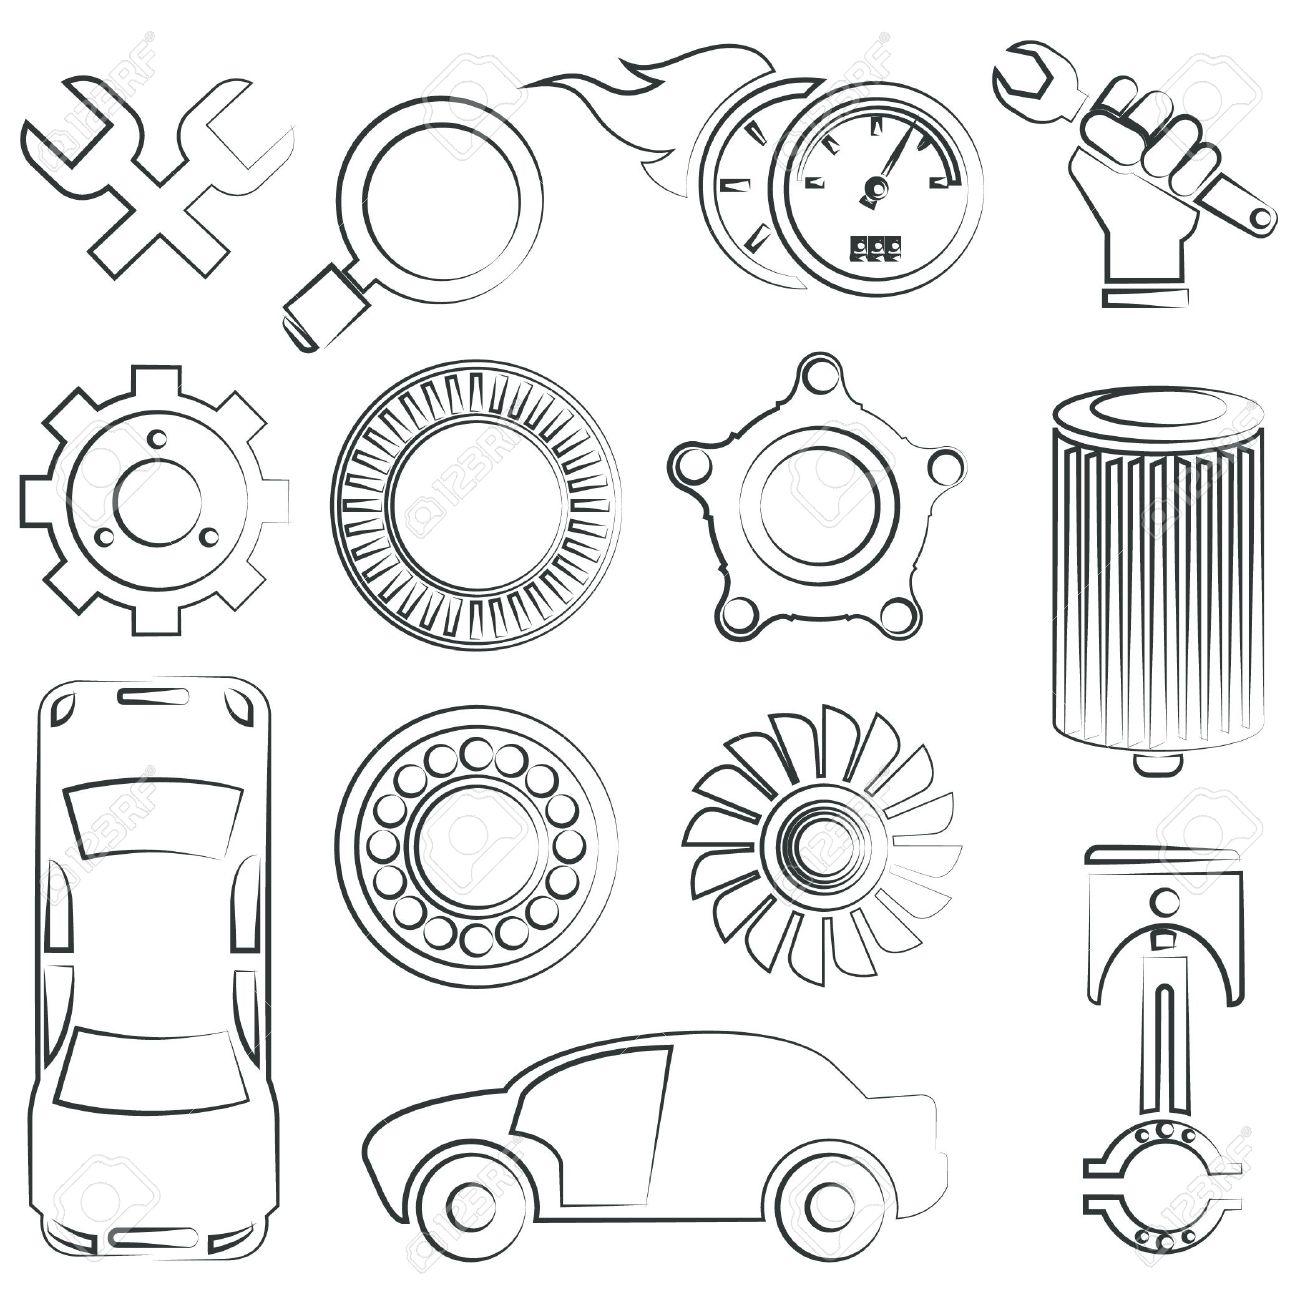 Sketched car parts set royalty free cliparts vectors and stock